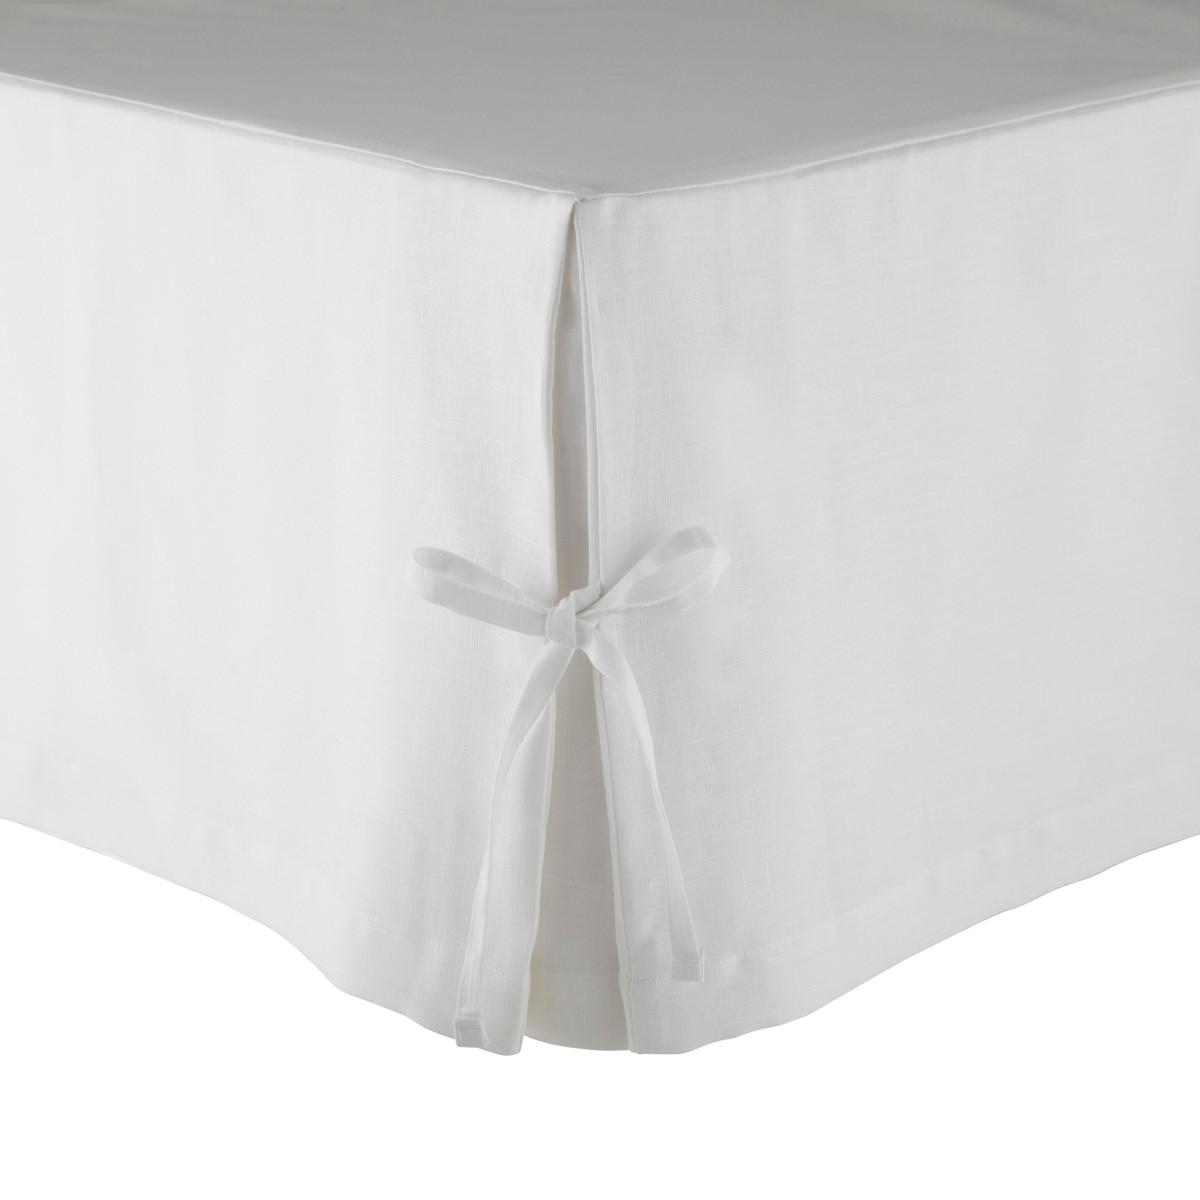 Cache sommier Lin Blanc 140 x 190 cm (photo)